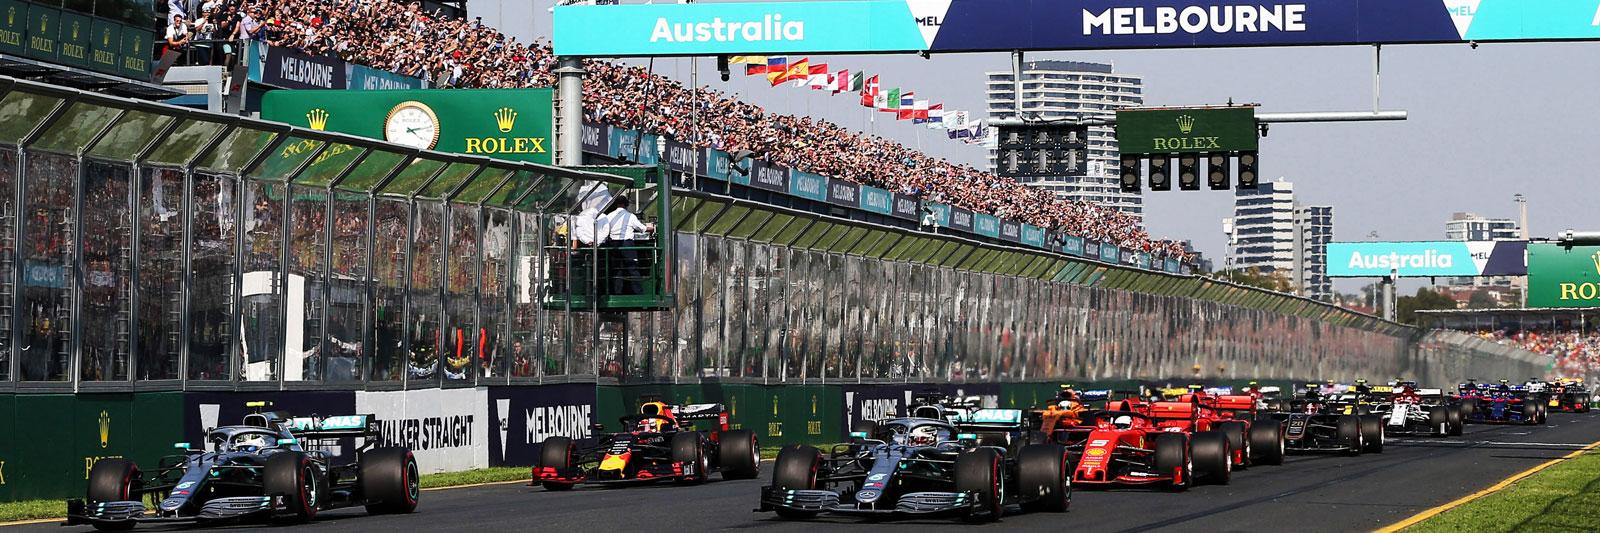 Australian Grand Prix with Grand Prix